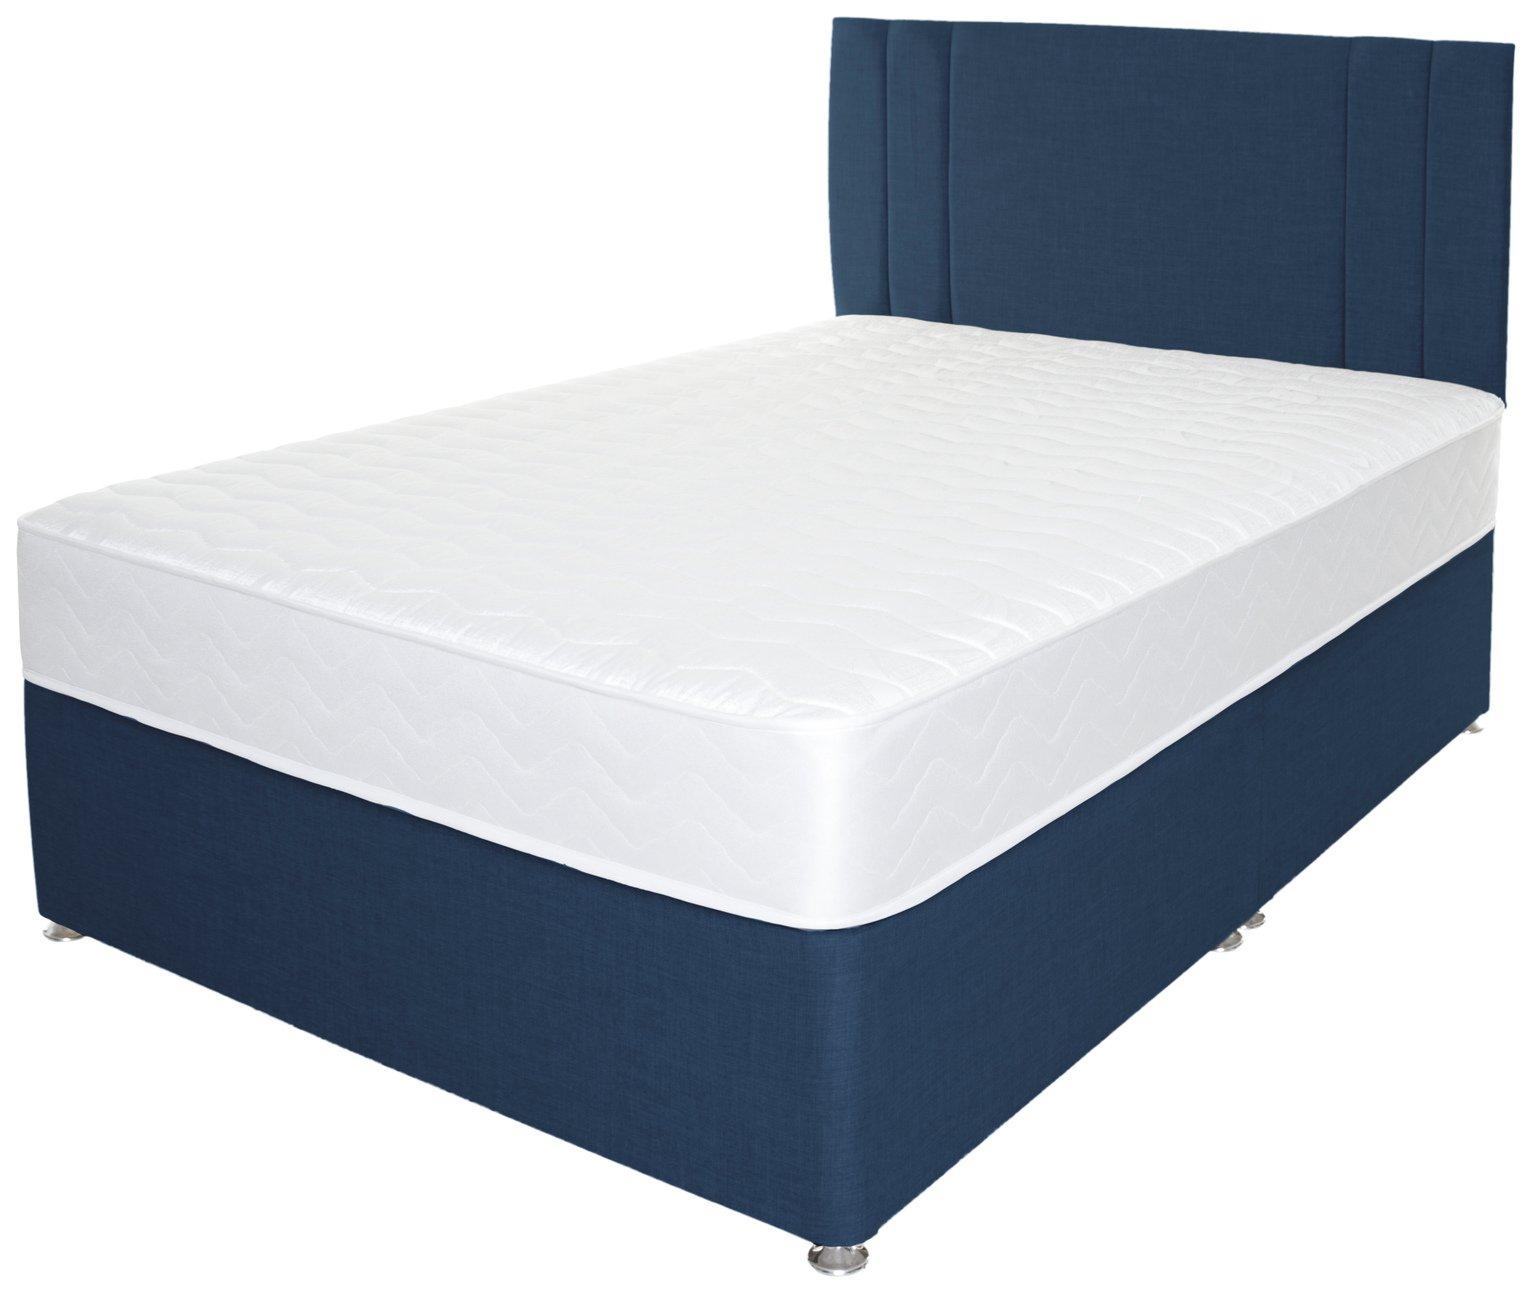 Airpsrung Henlow 1200 Memory Divan Bed & Headboard - Blue at Argos